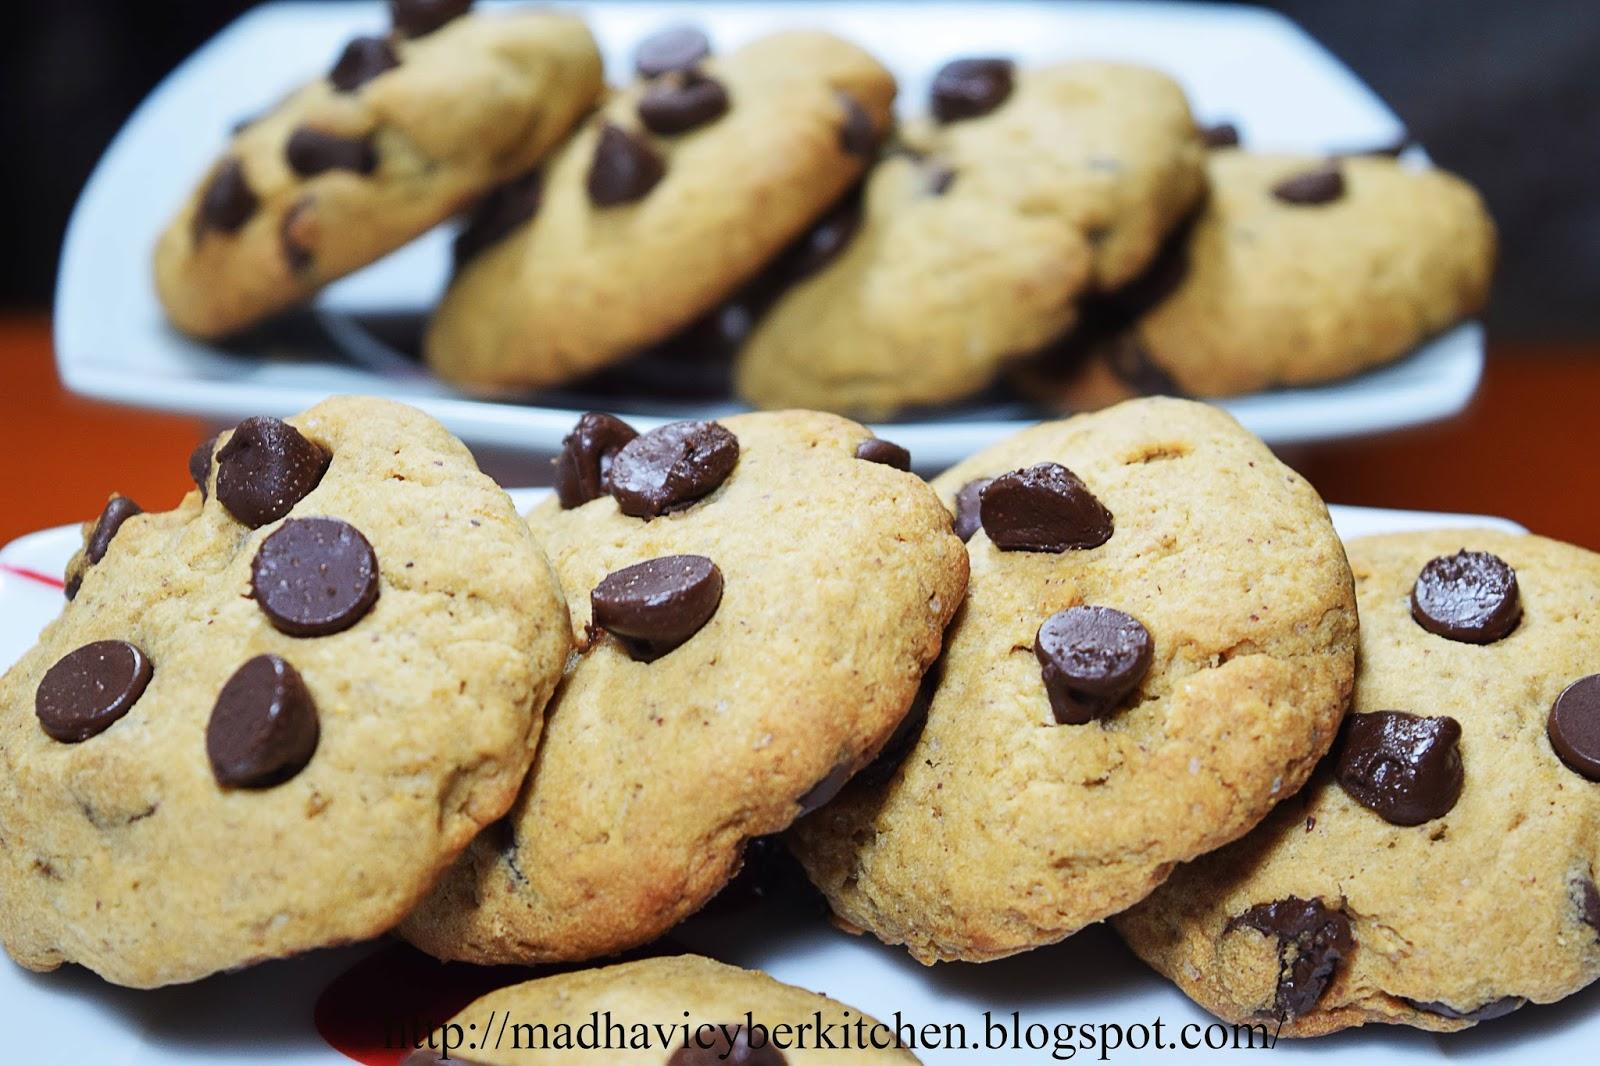 Chestnut Flour Chocolate Chip Cookies